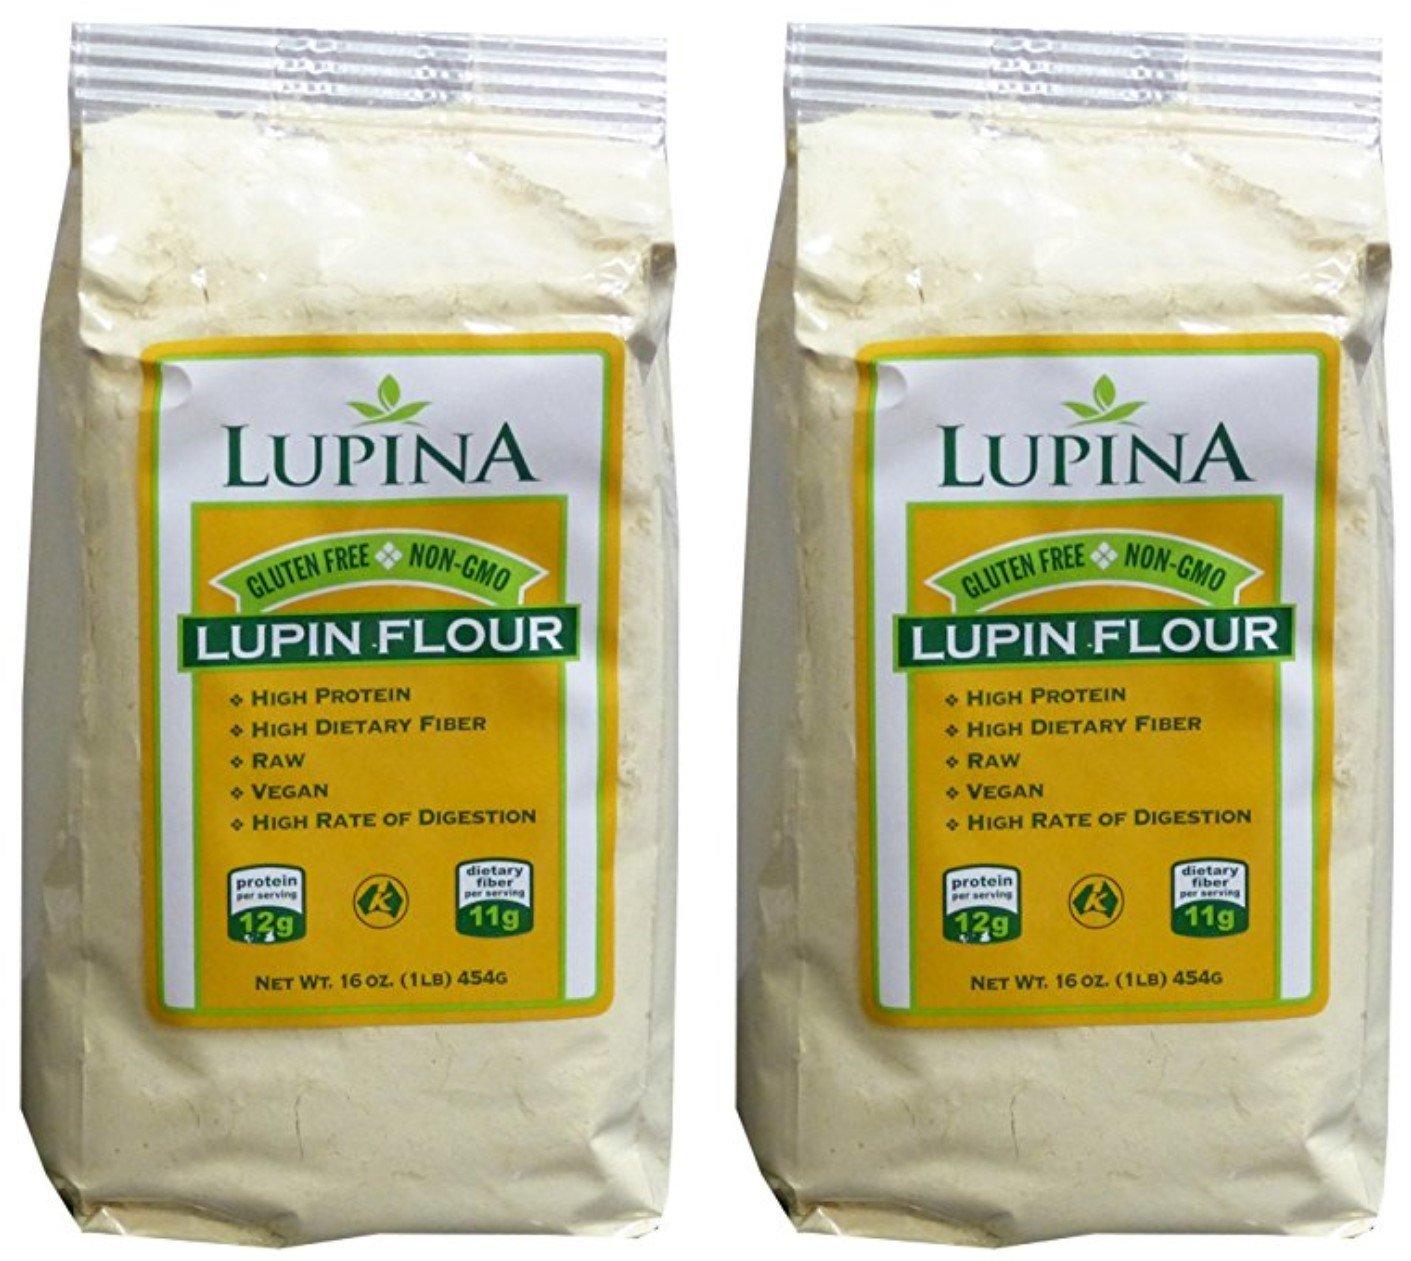 Lupin Flour Gluten Free, High protein, Fiber-Rich Lupina 2 Pack